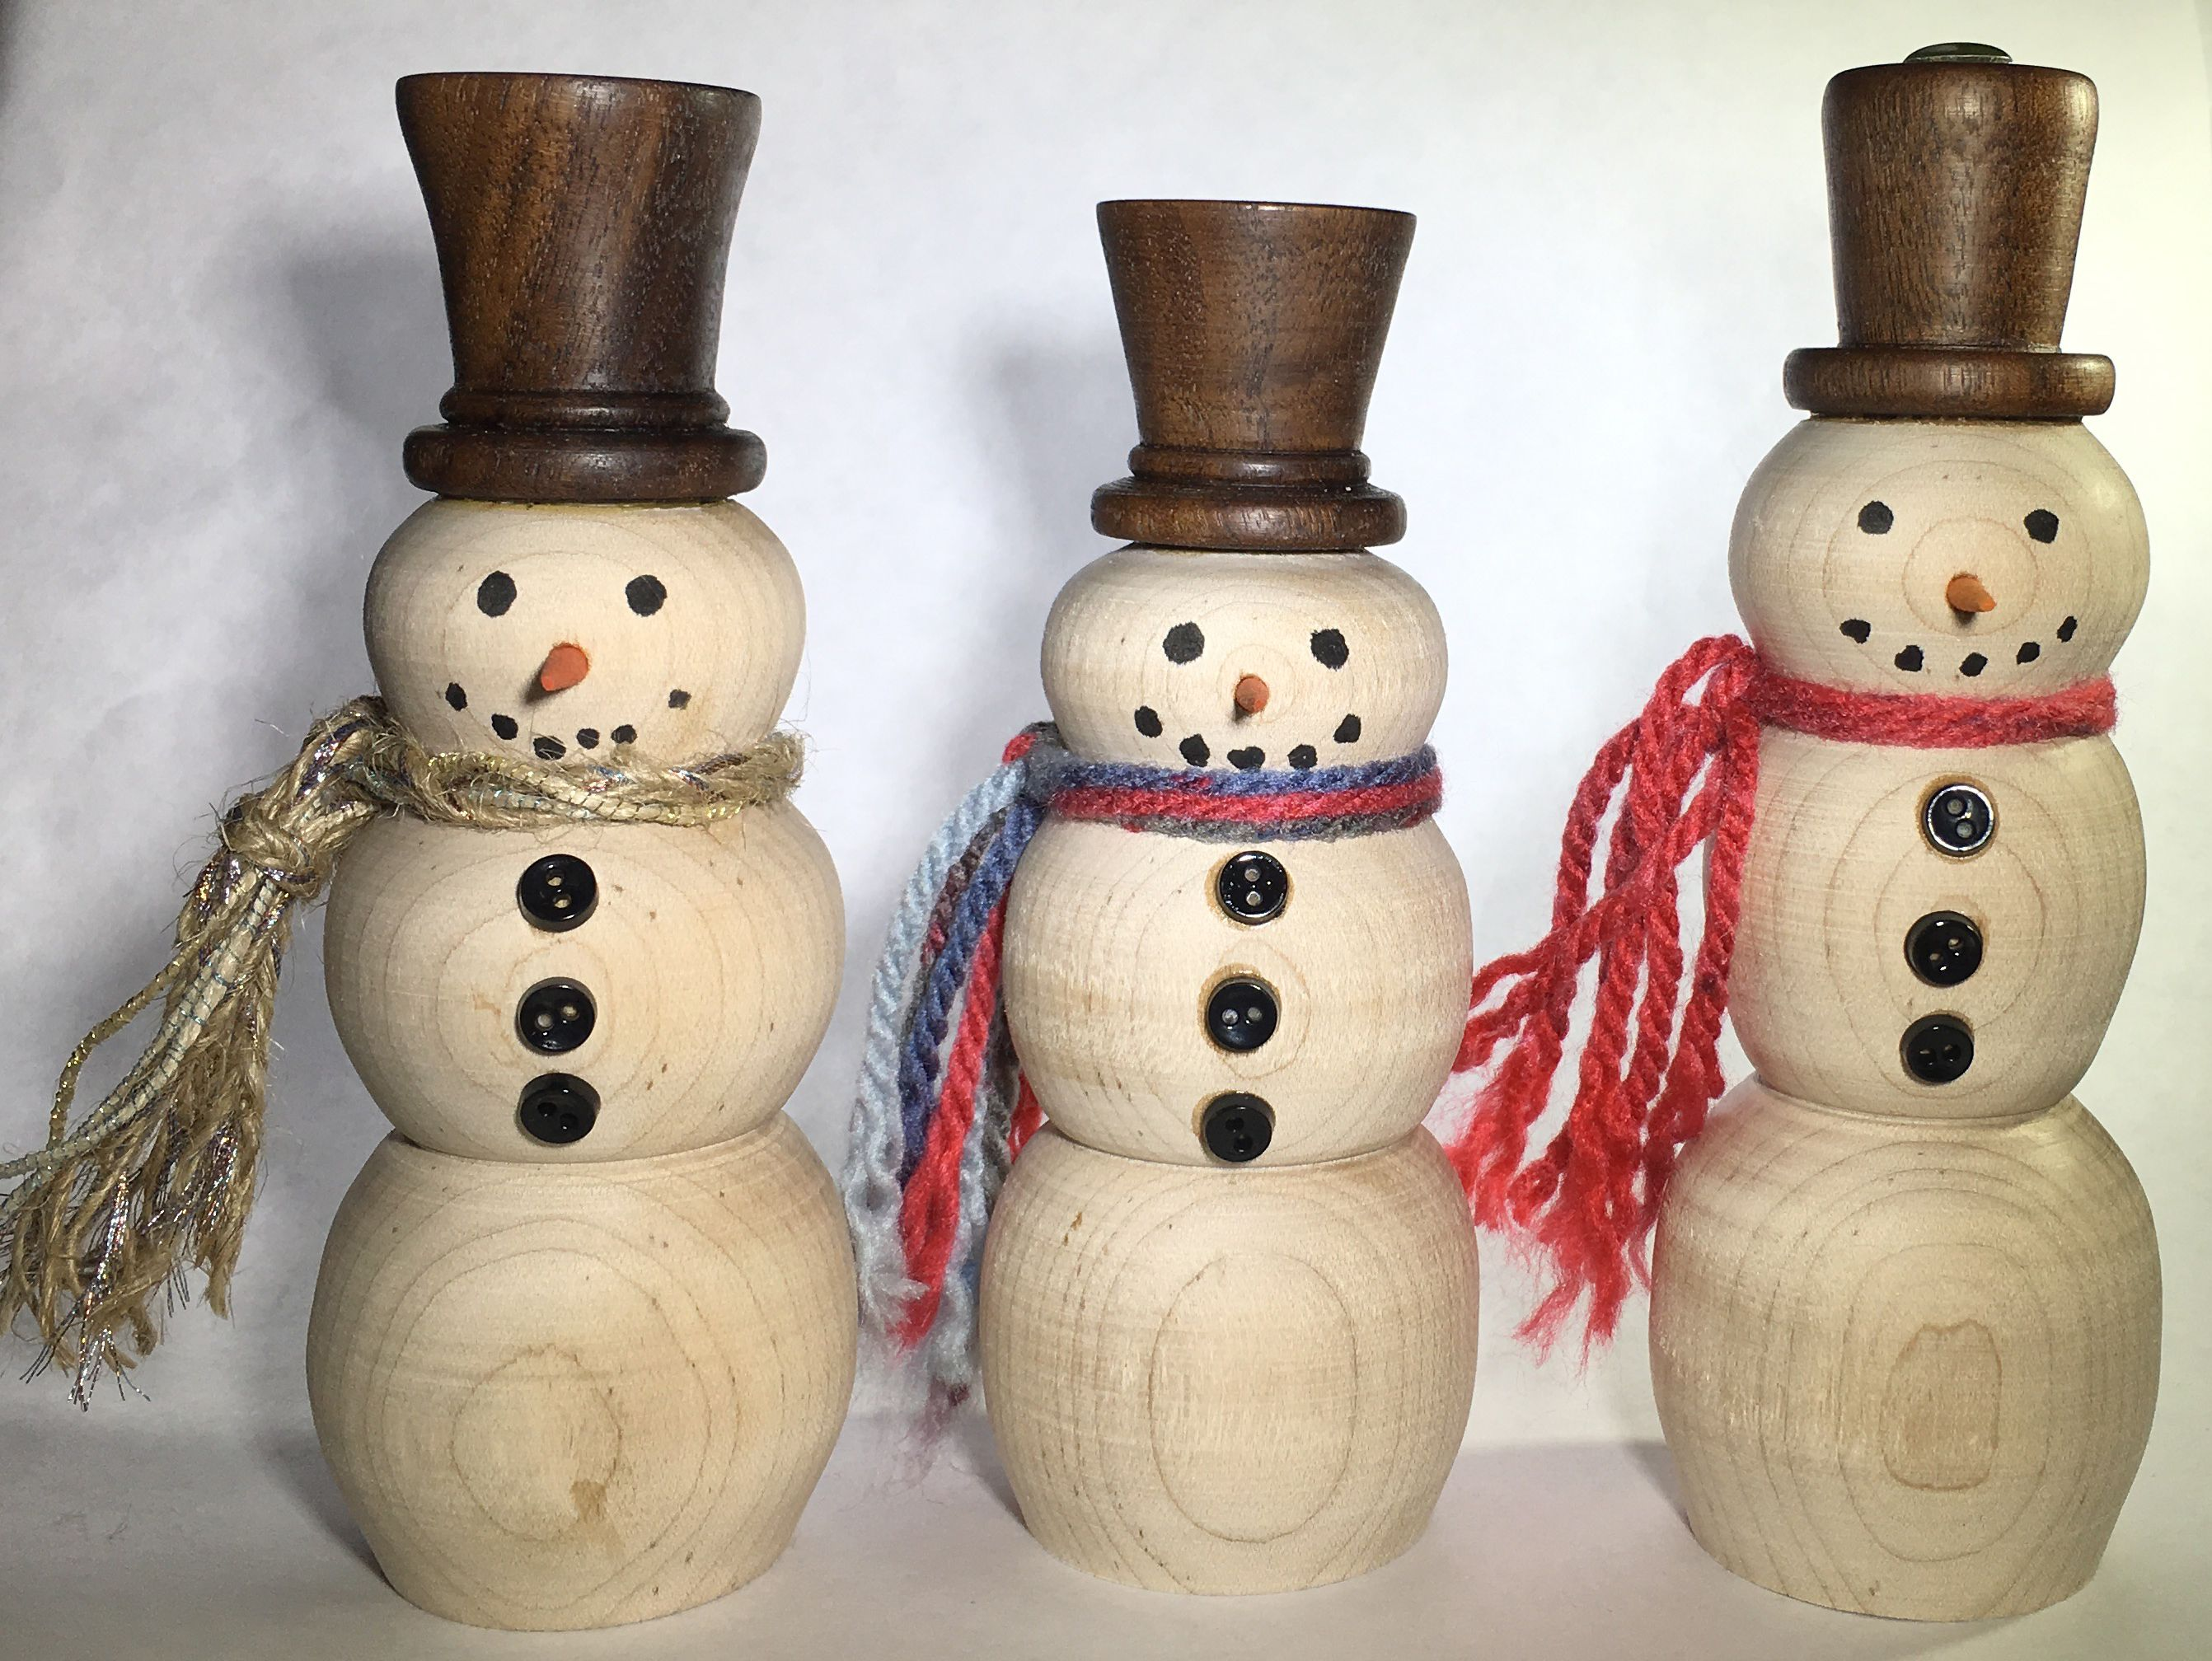 Wood Snowmen Sale Wood Snowman Snowman Christmas Decorations Wood Christmas Ornaments